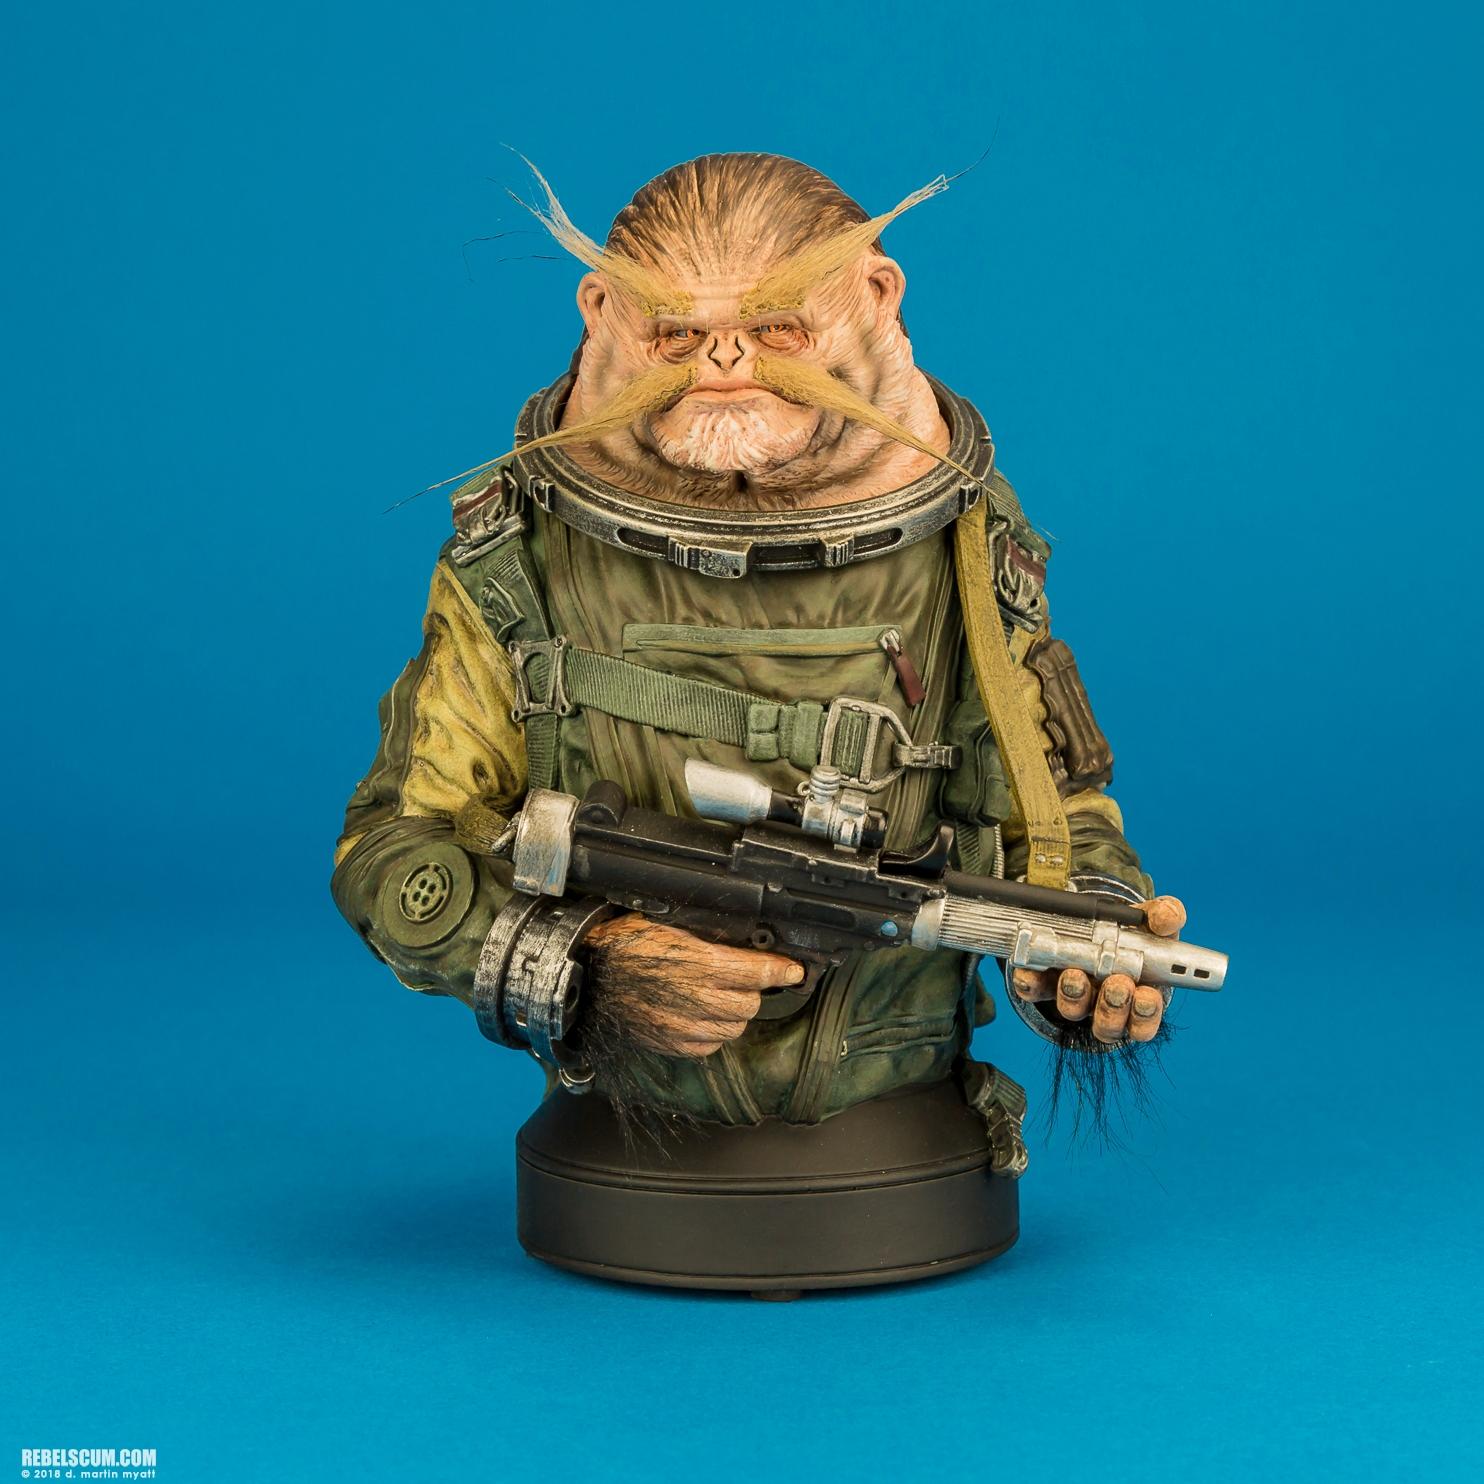 Star Wars Gentle Giant Rogue One Bistan Mini-Bust Statue